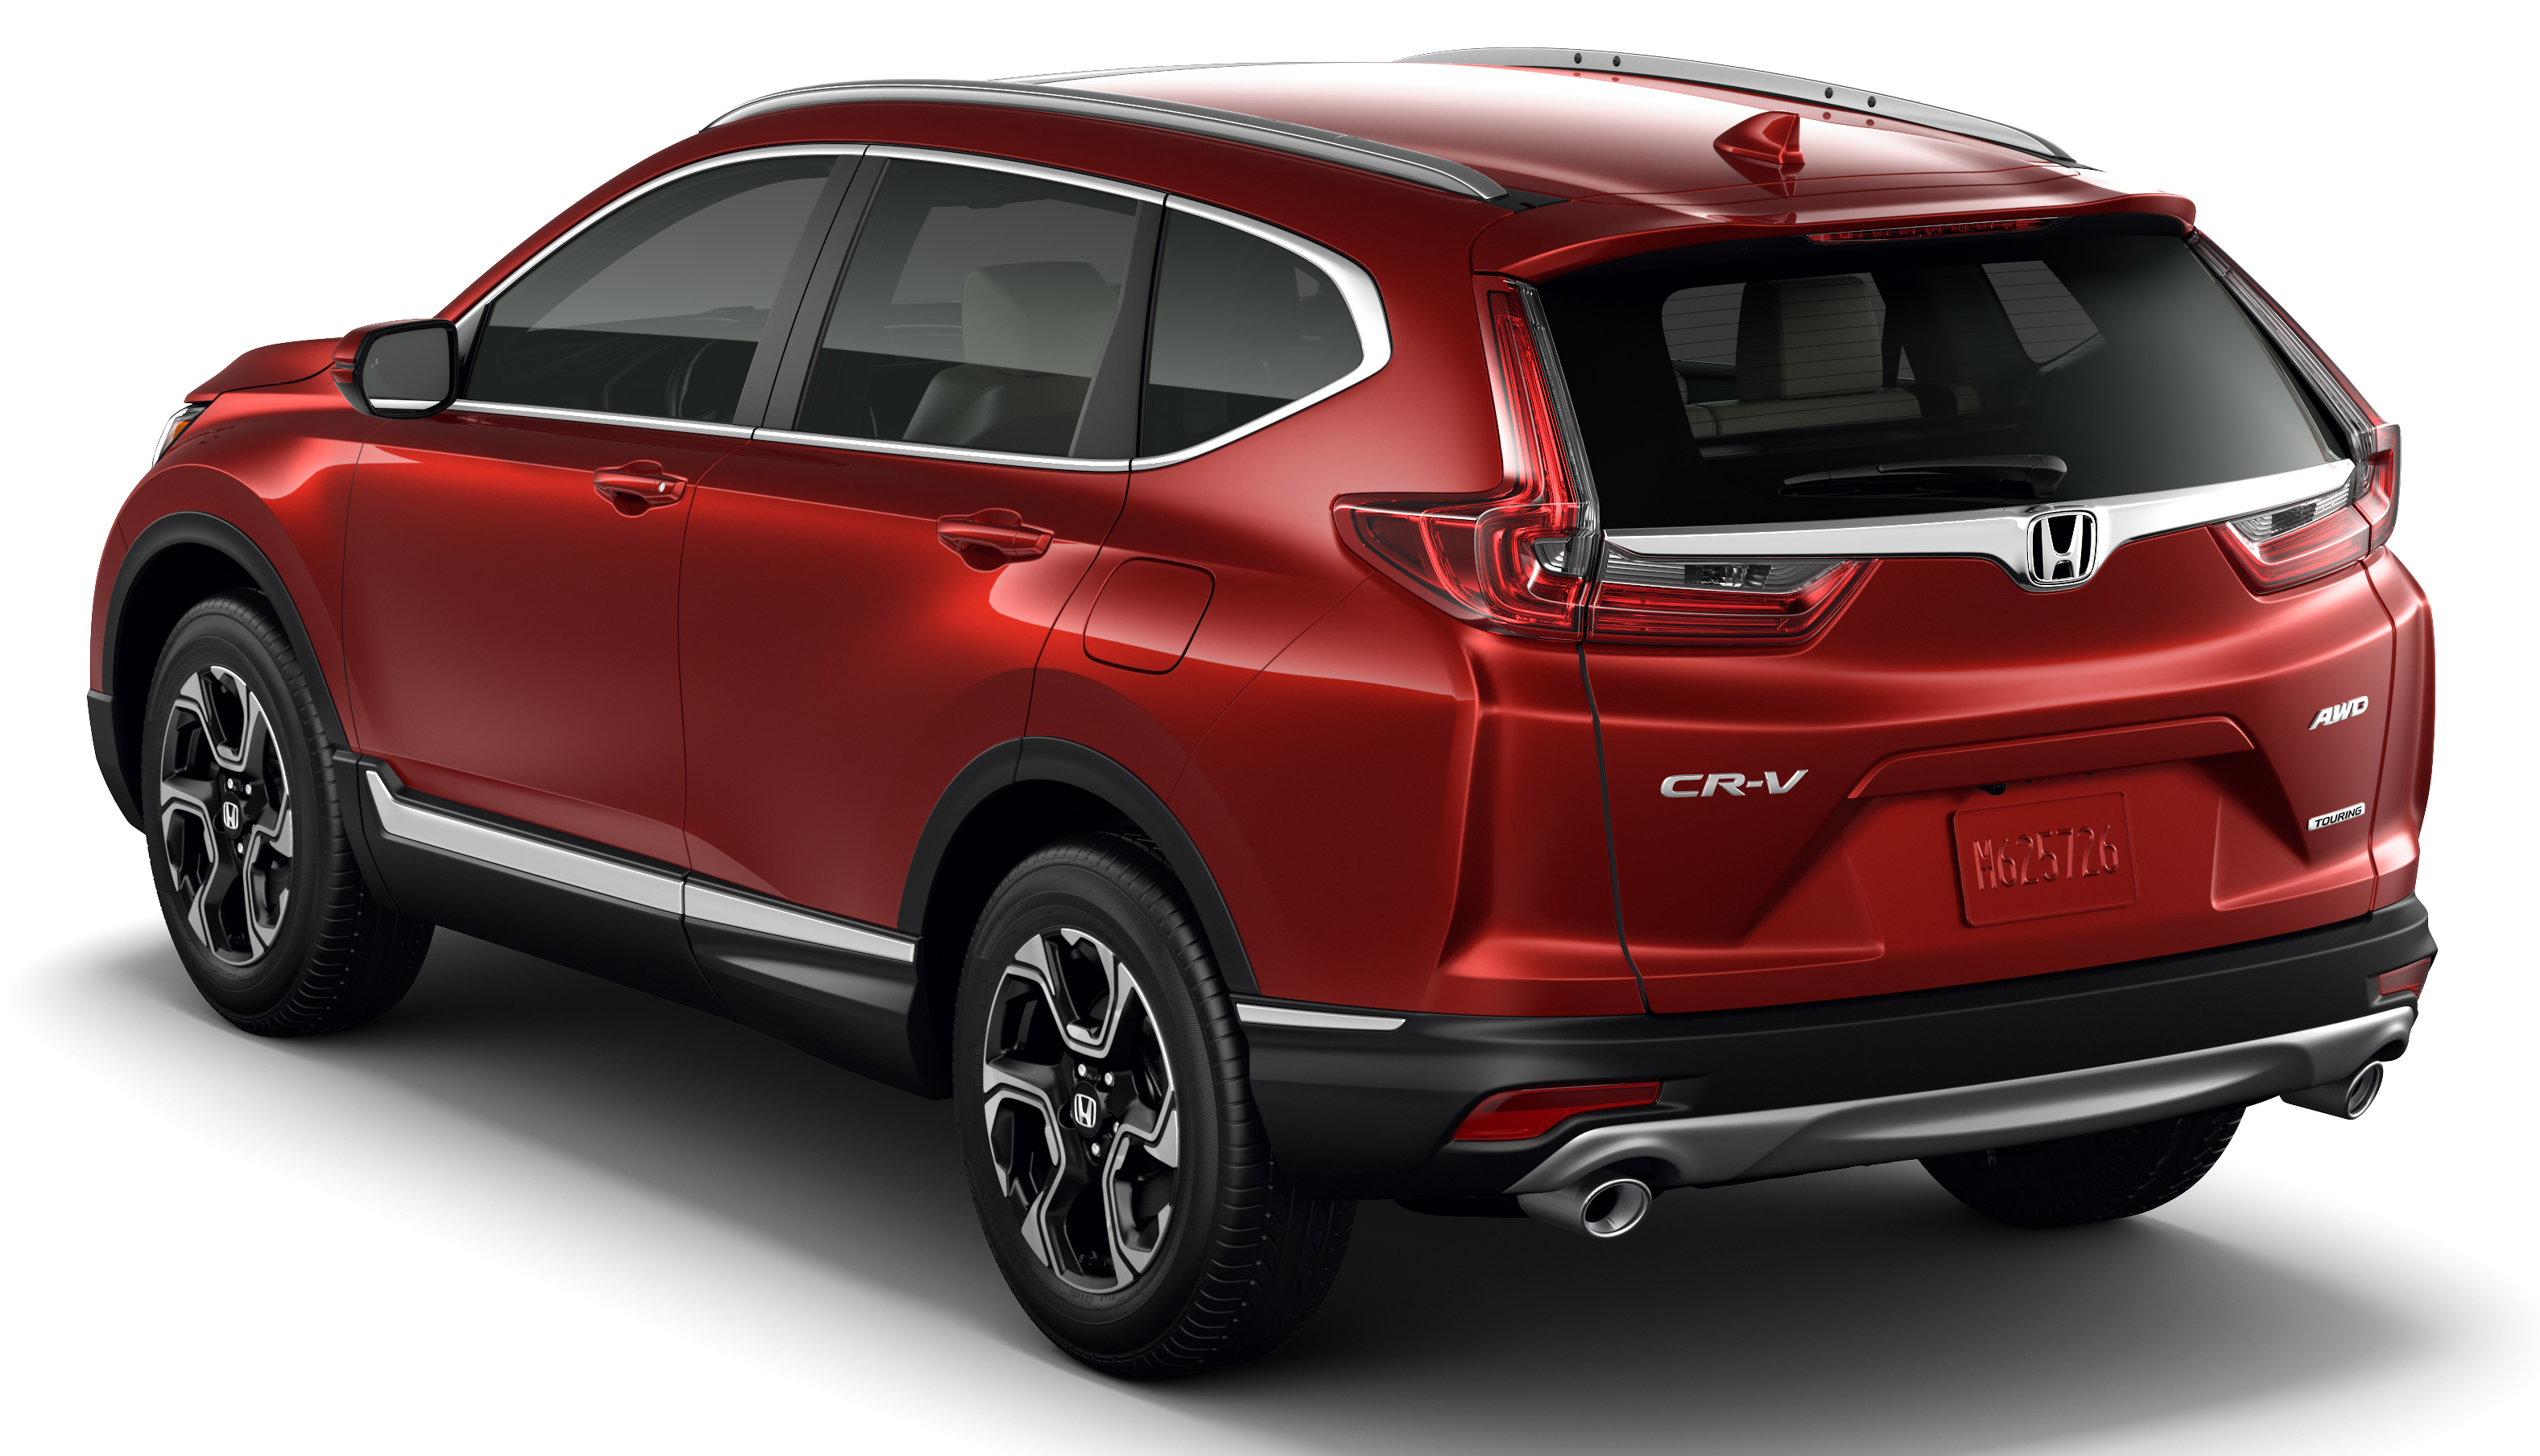 2017 honda cr v unveiled new 190 hp 1 5l turbo engine